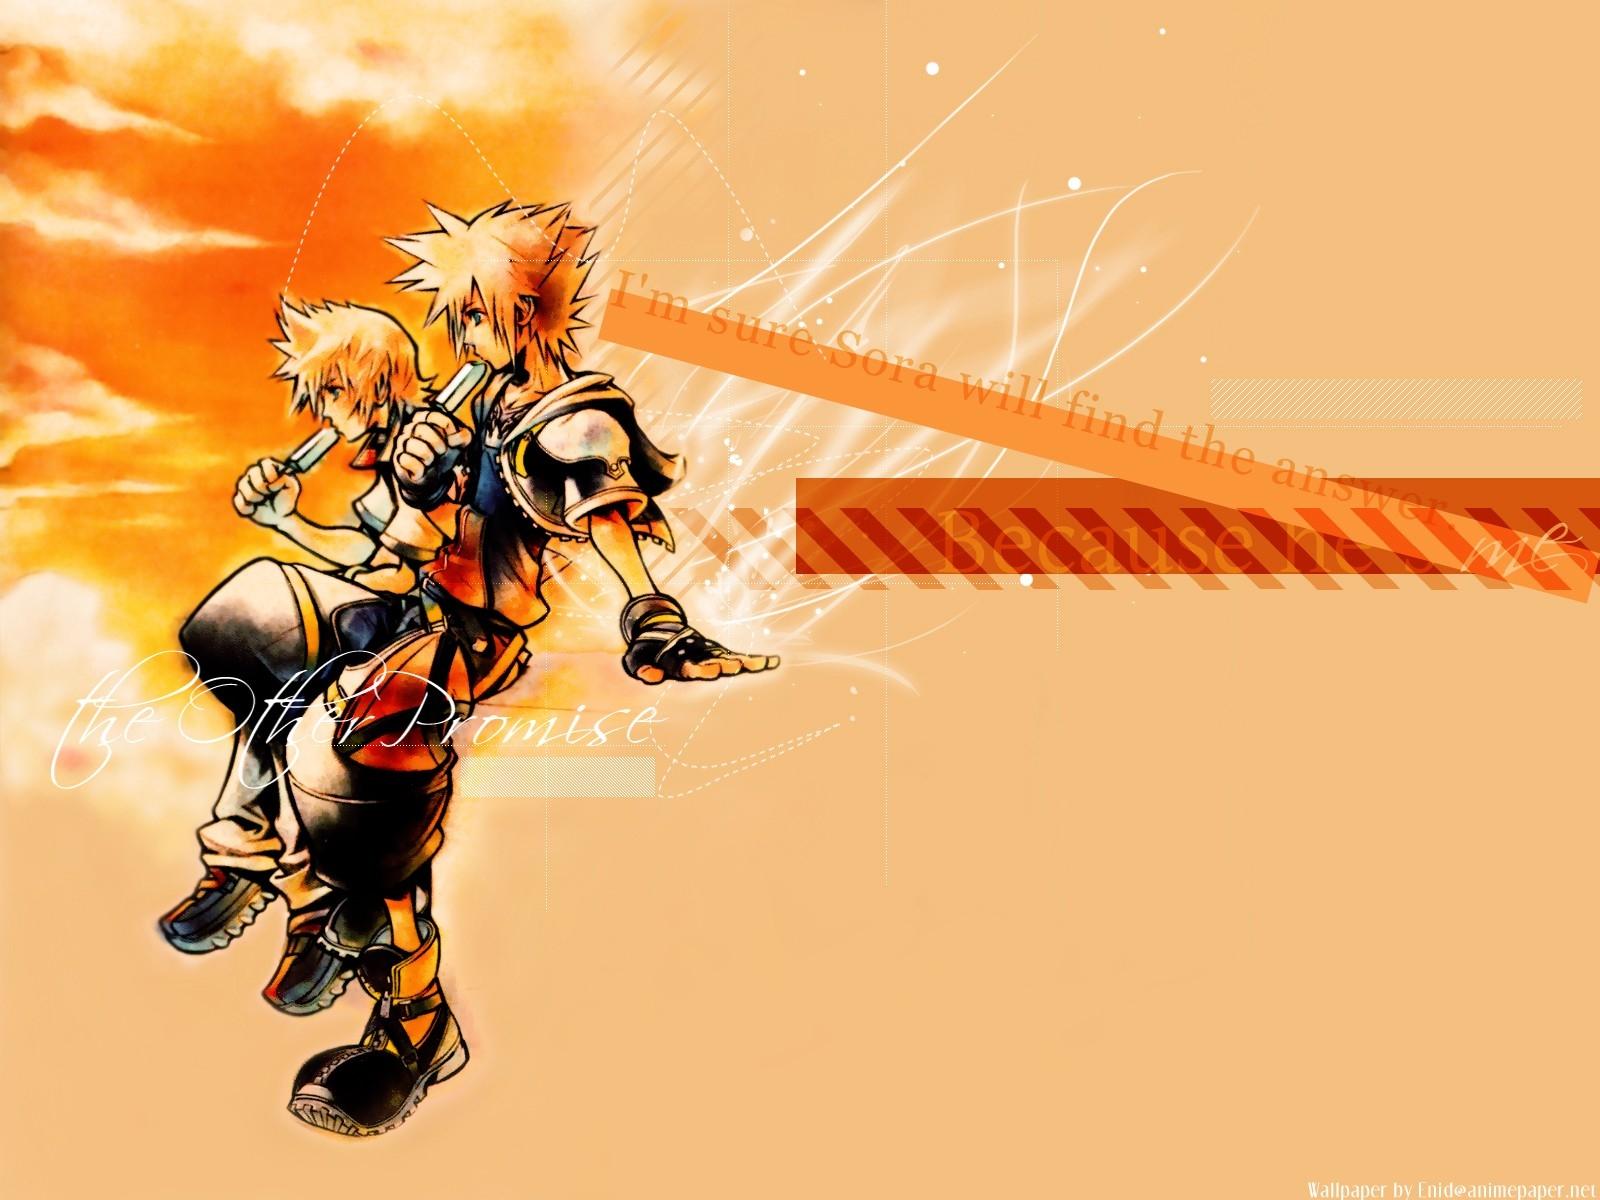 Kingdom Hearts Sora Wallpaper 1920x1080 Kingdom Hearts Sora (K...